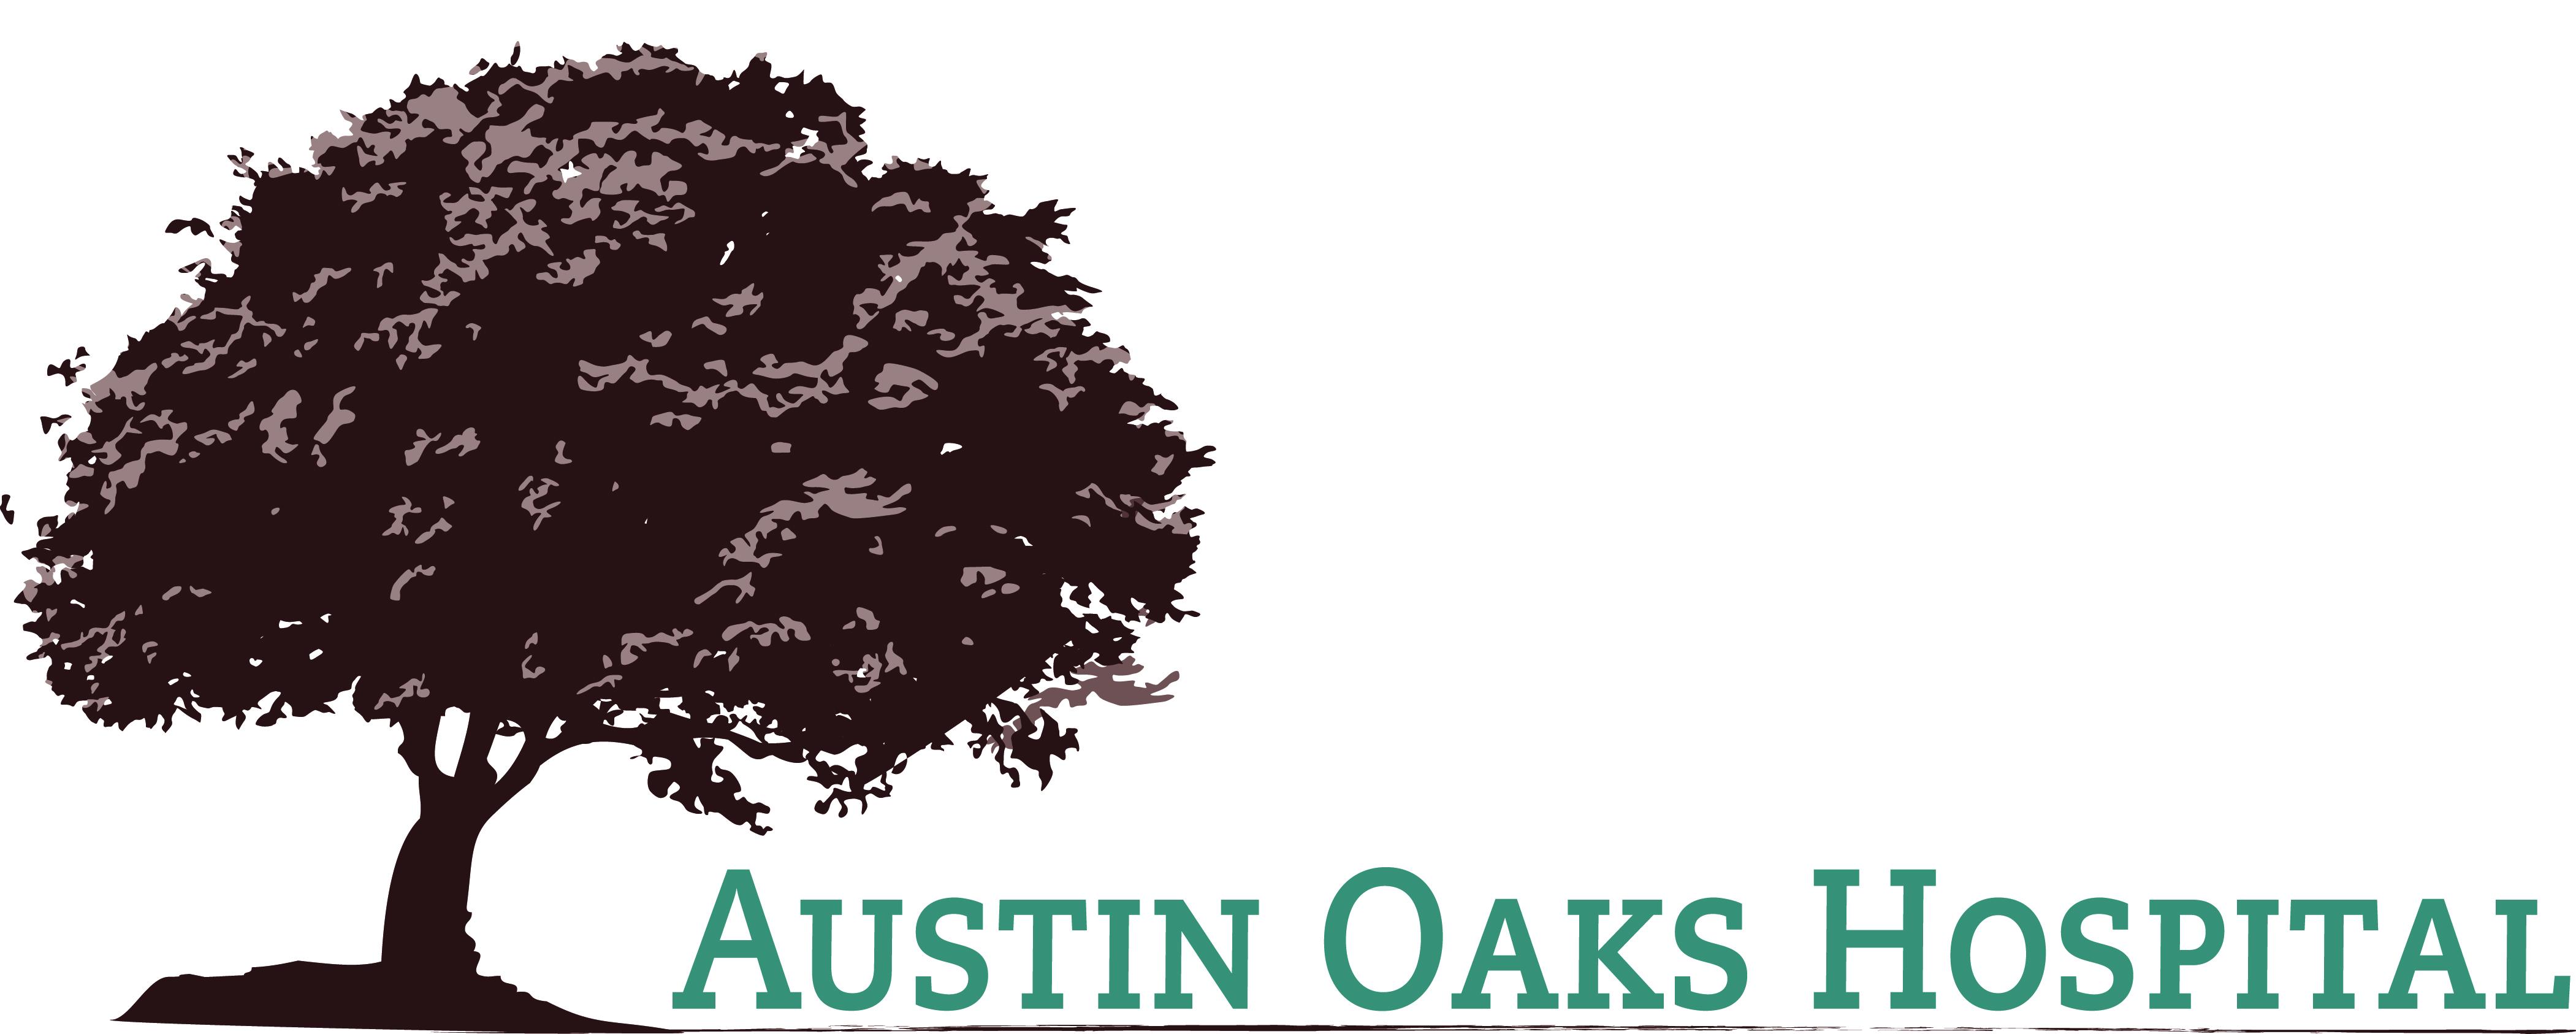 Austin Oaks